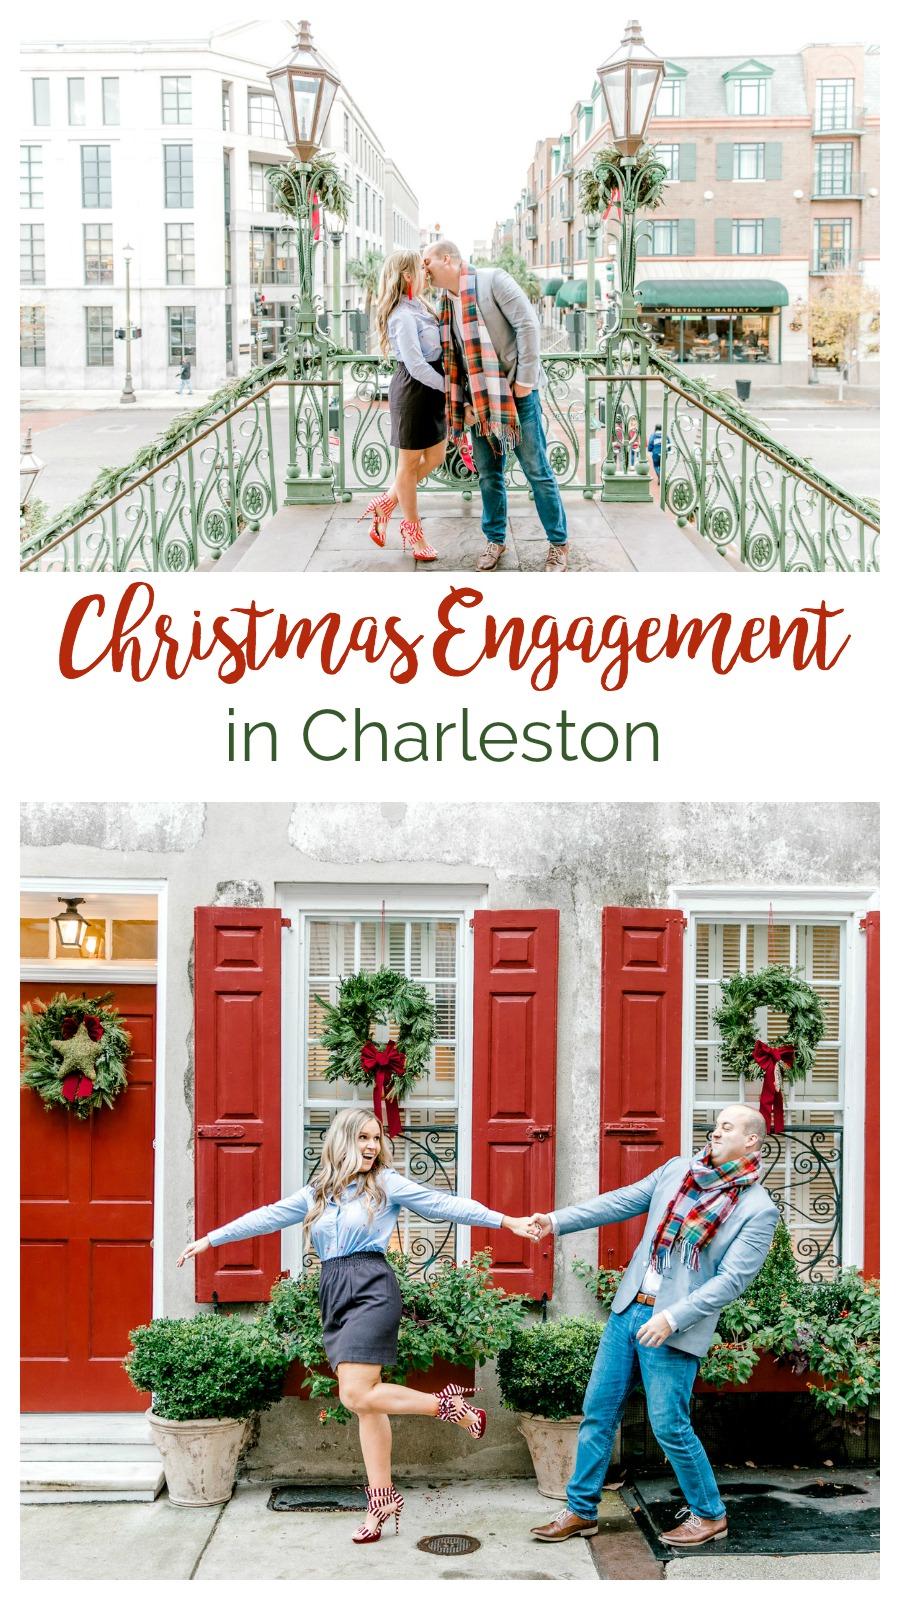 Megan and John: A Festive Christmas Engagement in Downtown Charleston | Palmetto State Weddings | Emma Lili Photography | Christmas couple photos | Charleston engagement photography | fun Christmas pictures